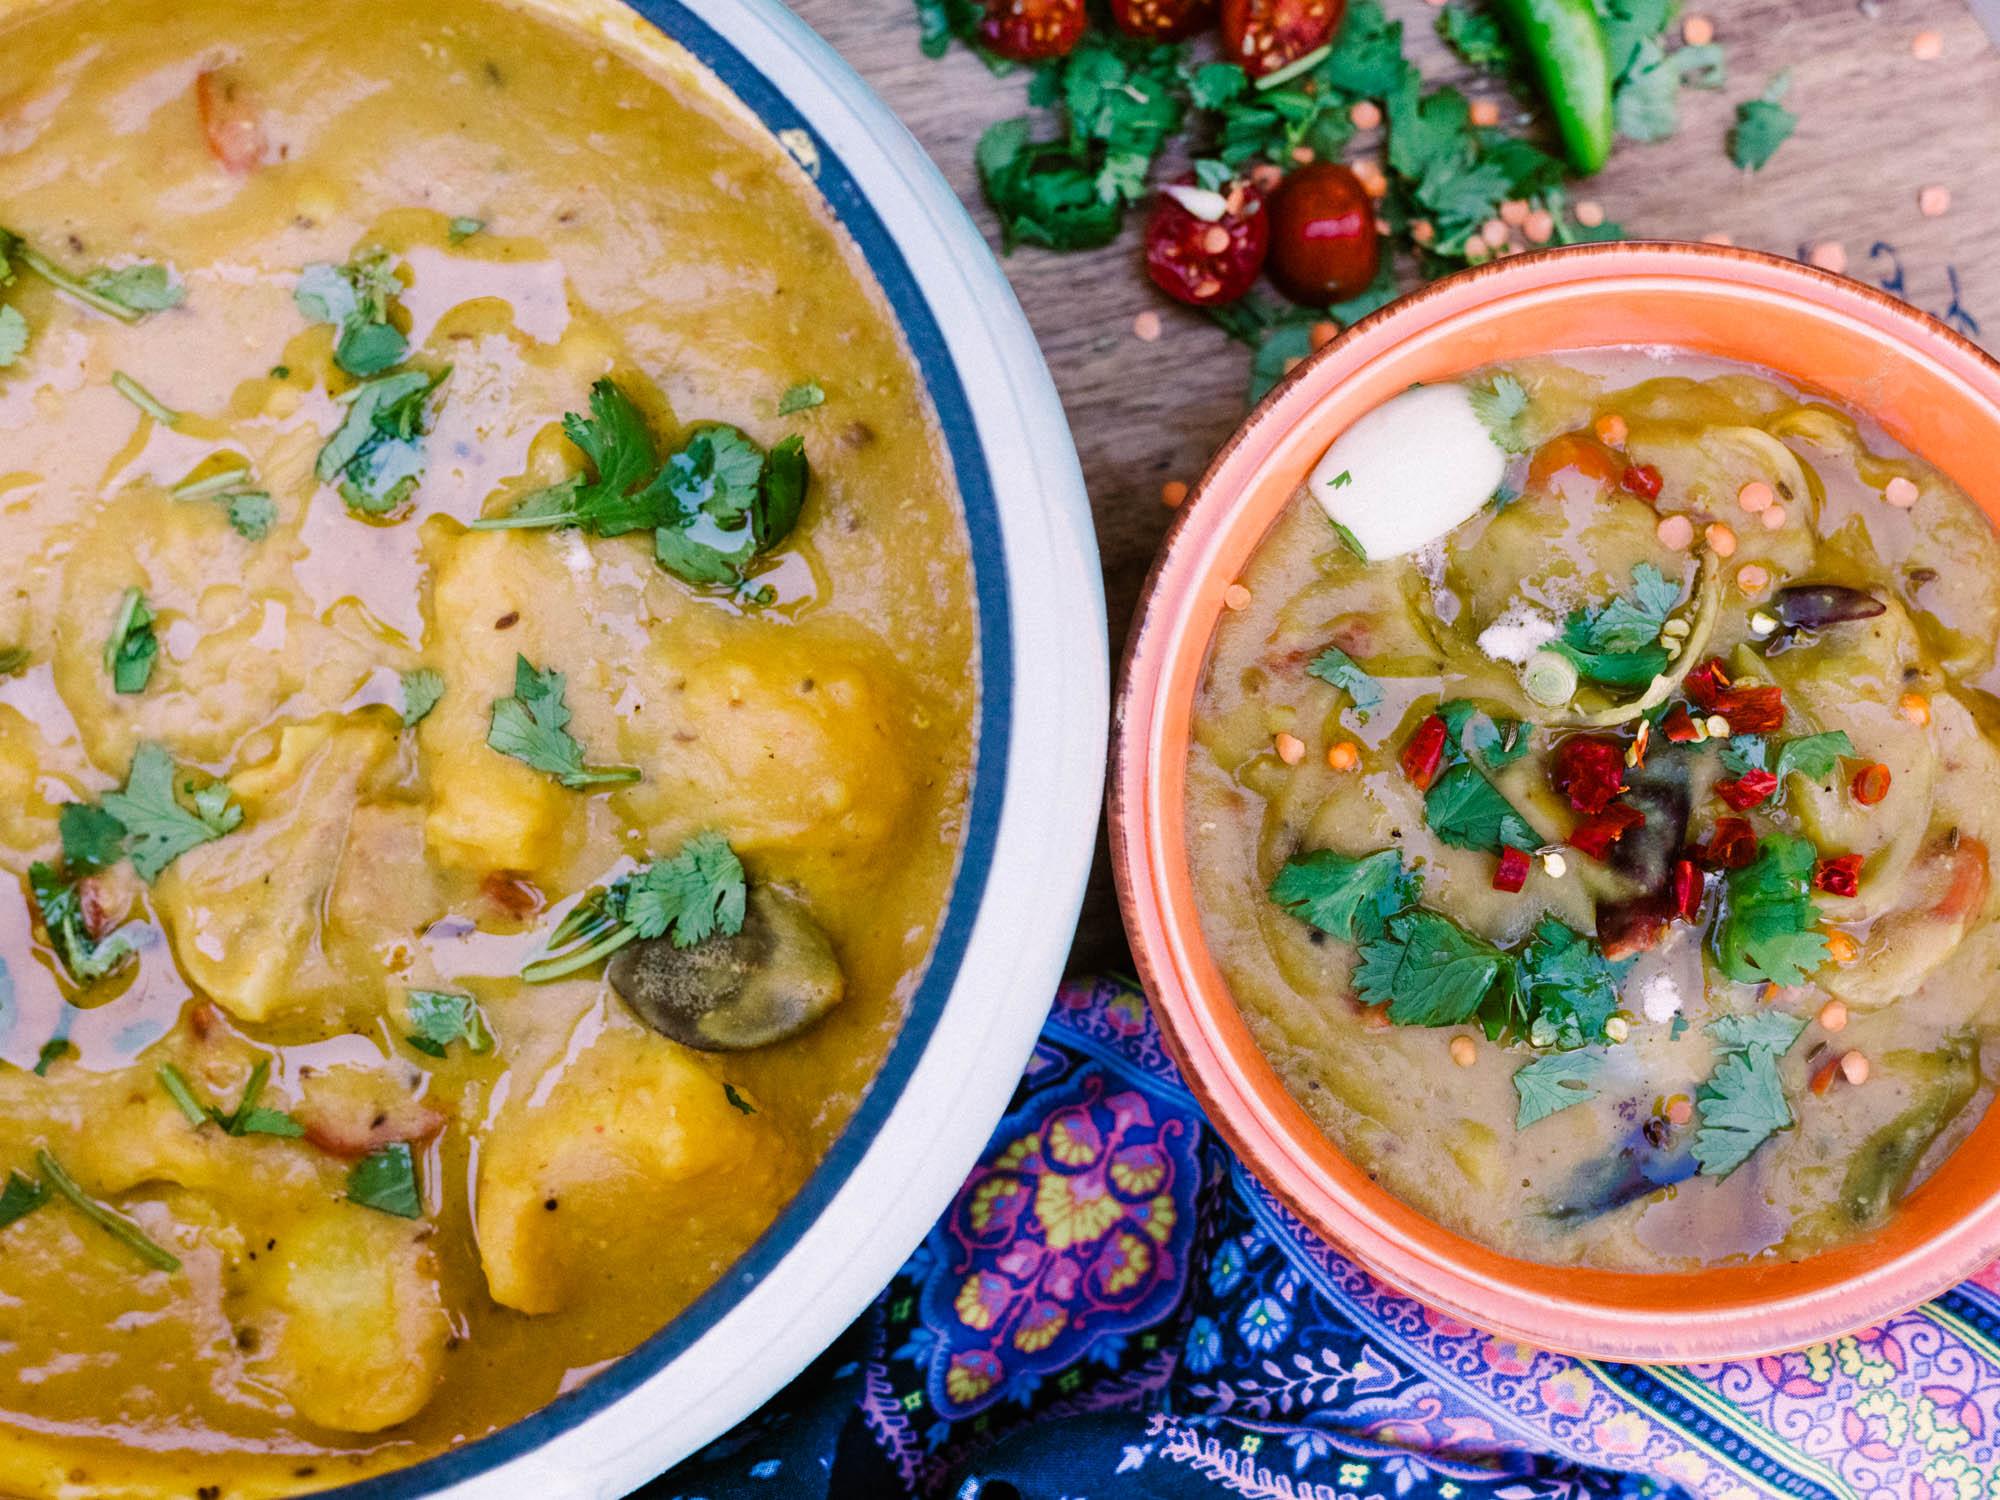 South Indian Tiffin Sambar - Let's Taco Bout it Blog